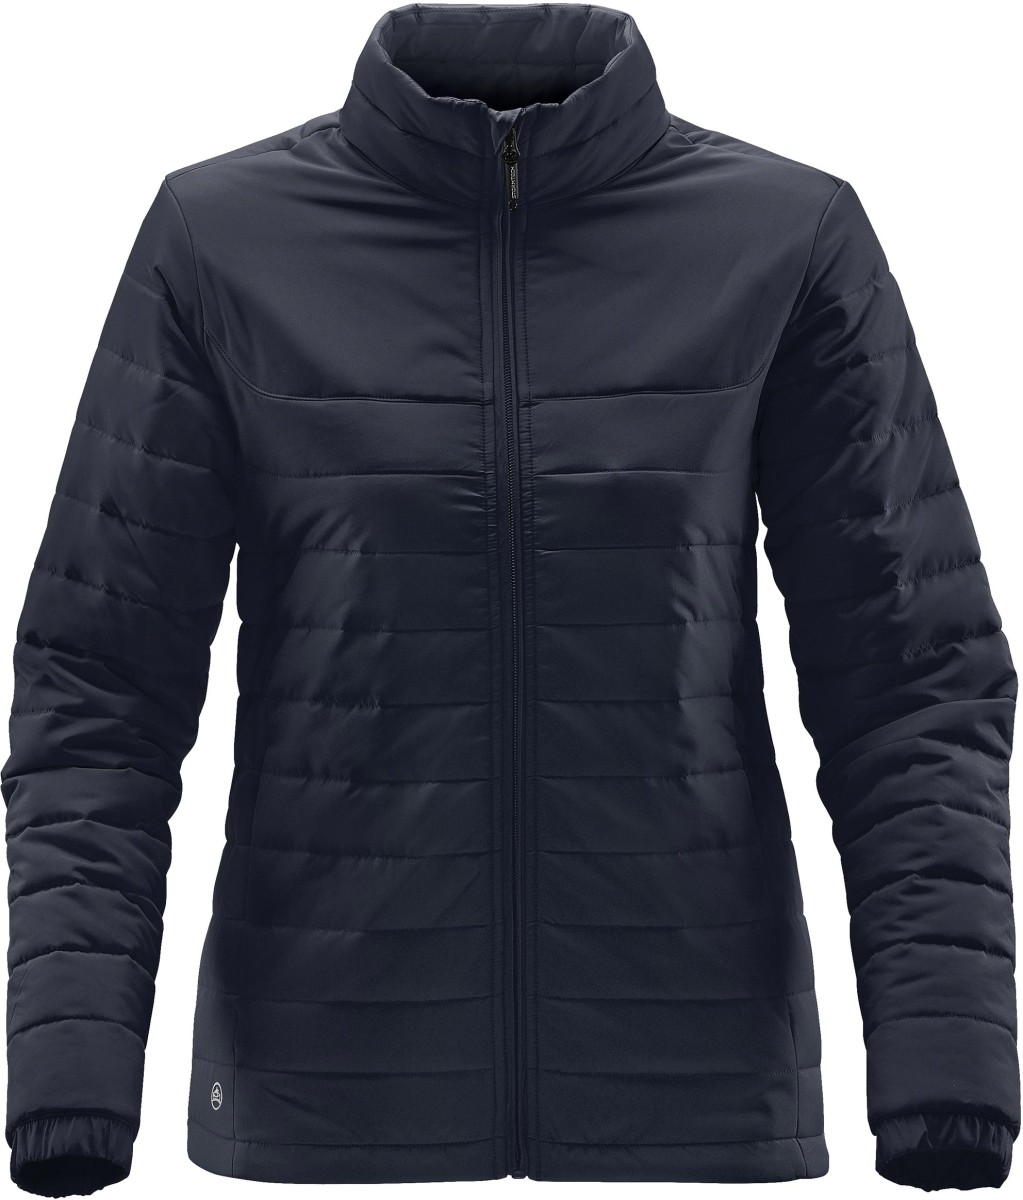 Stormtech Womens Nautilus Jacket